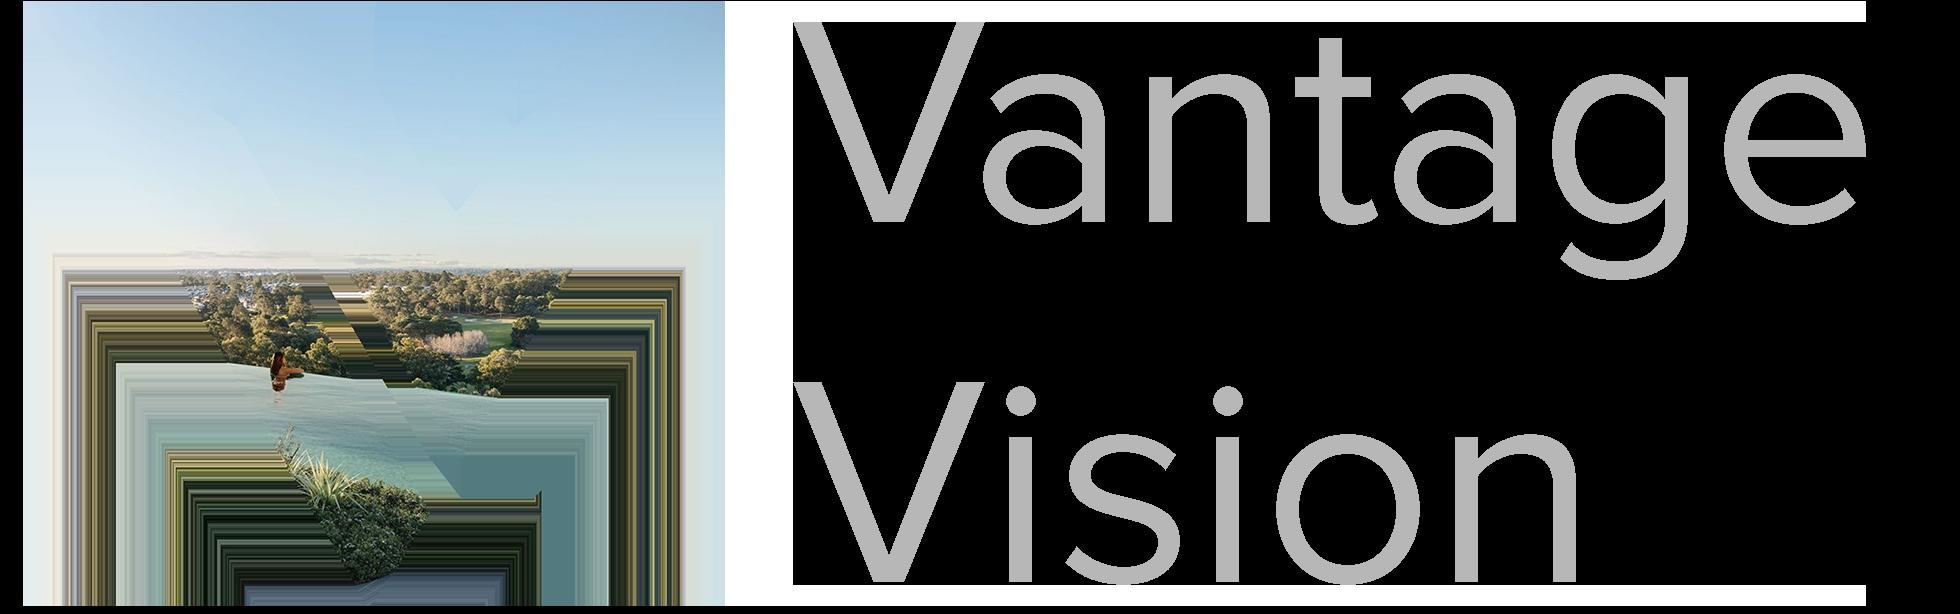 Vantage Vision